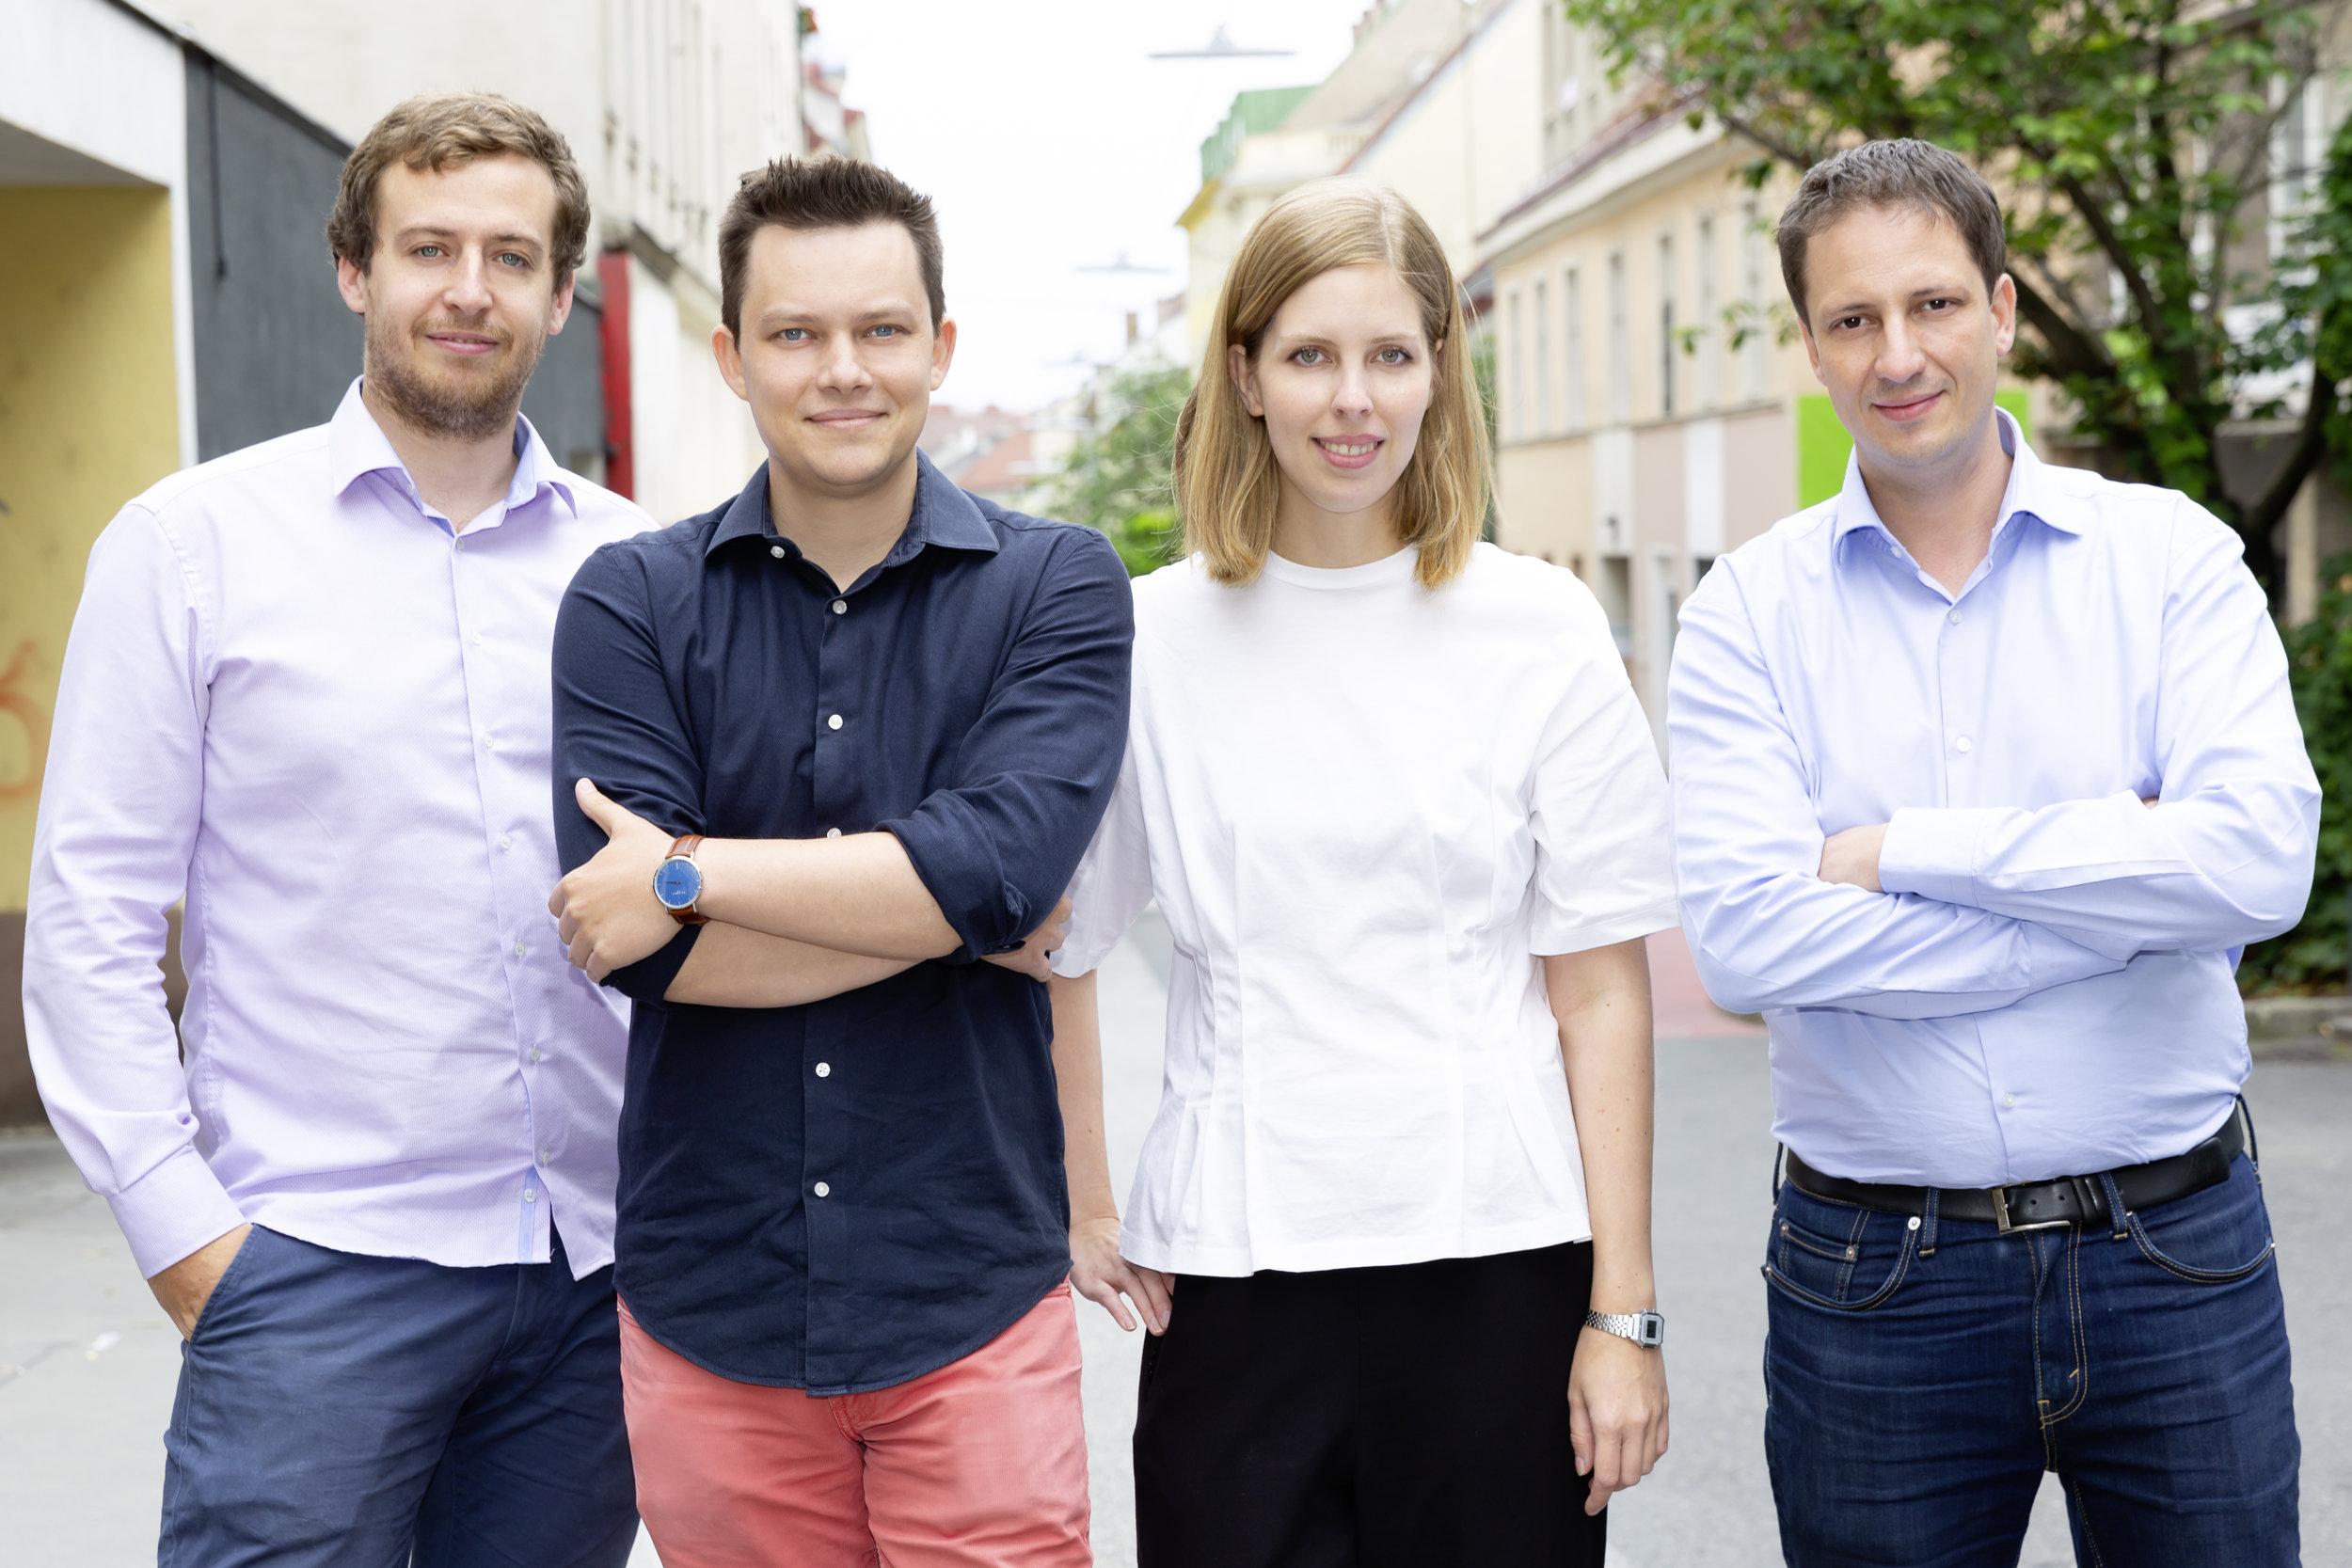 Joachim Ringsmuth/Sergiu Ardelean/Carina Doppler/Codin Popescu/ (from left to right) - Team Artivive © Artivive